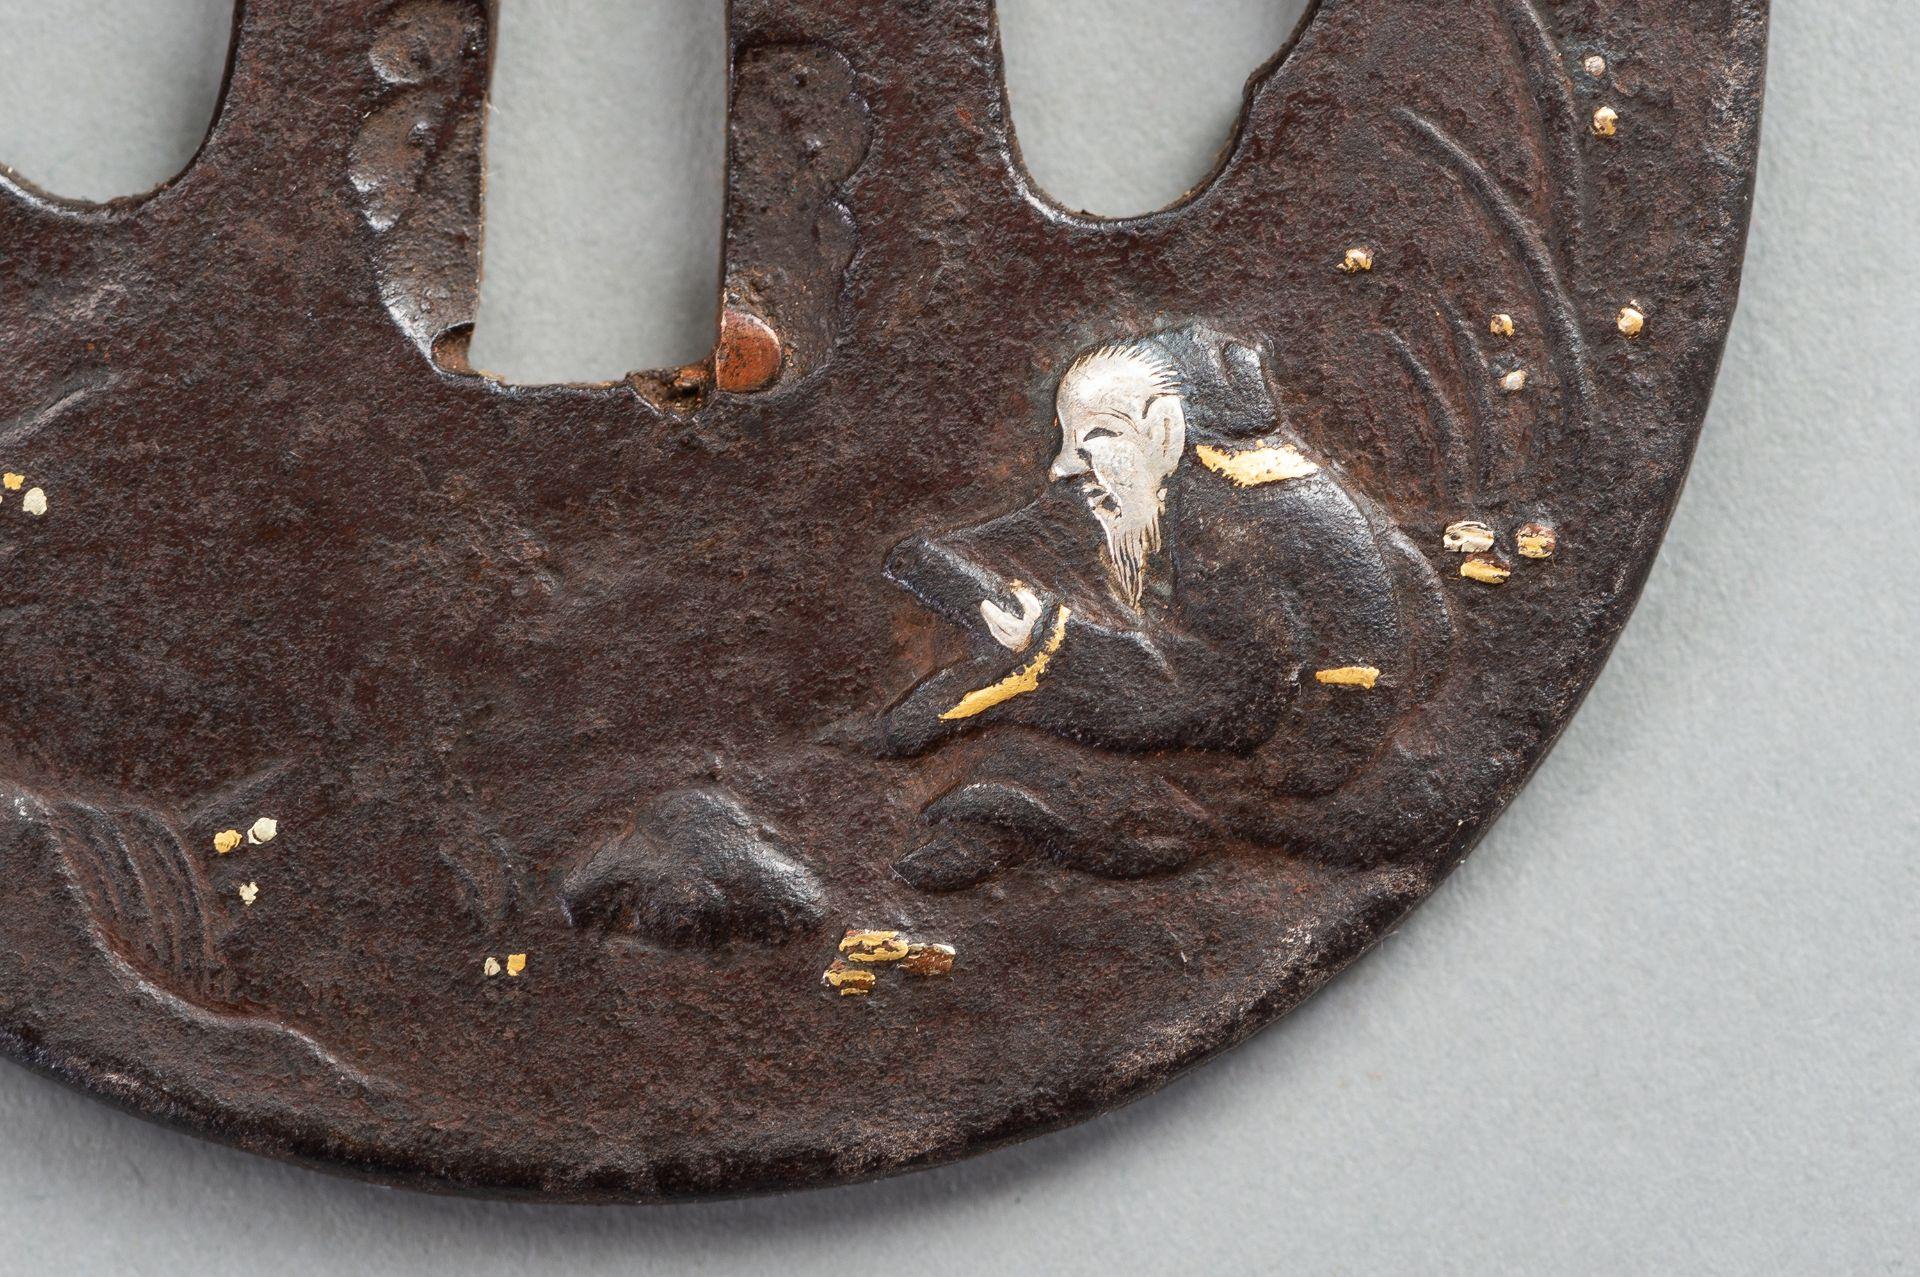 AN IRON TSUBA WITH A LITERATI - Image 2 of 4